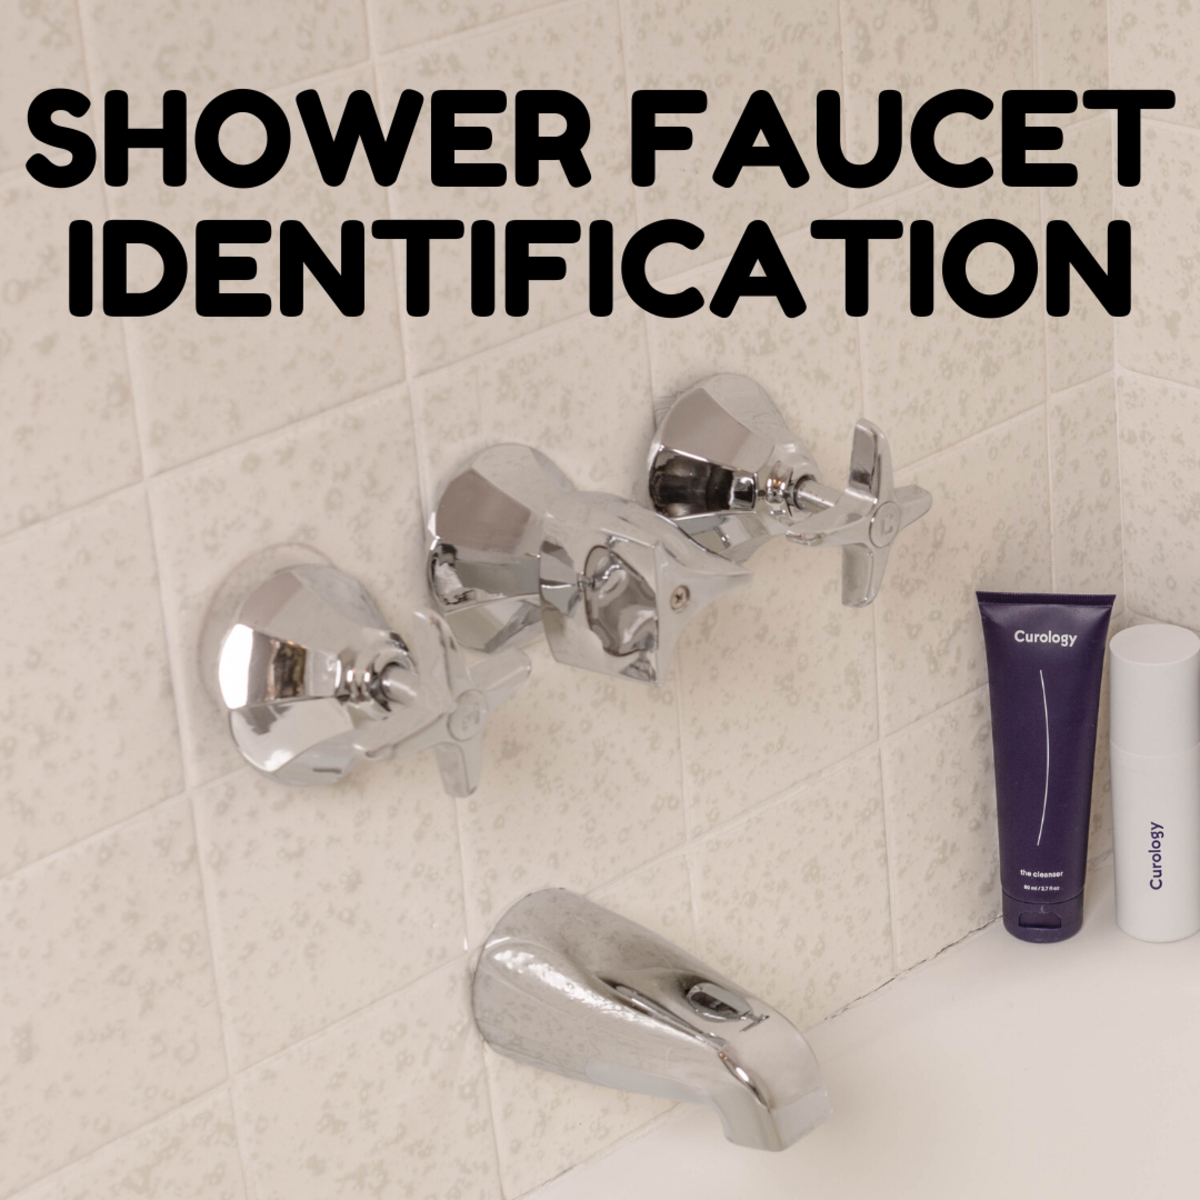 Shower Faucet (Valve/Stem) Cartridge Identification & Repairs